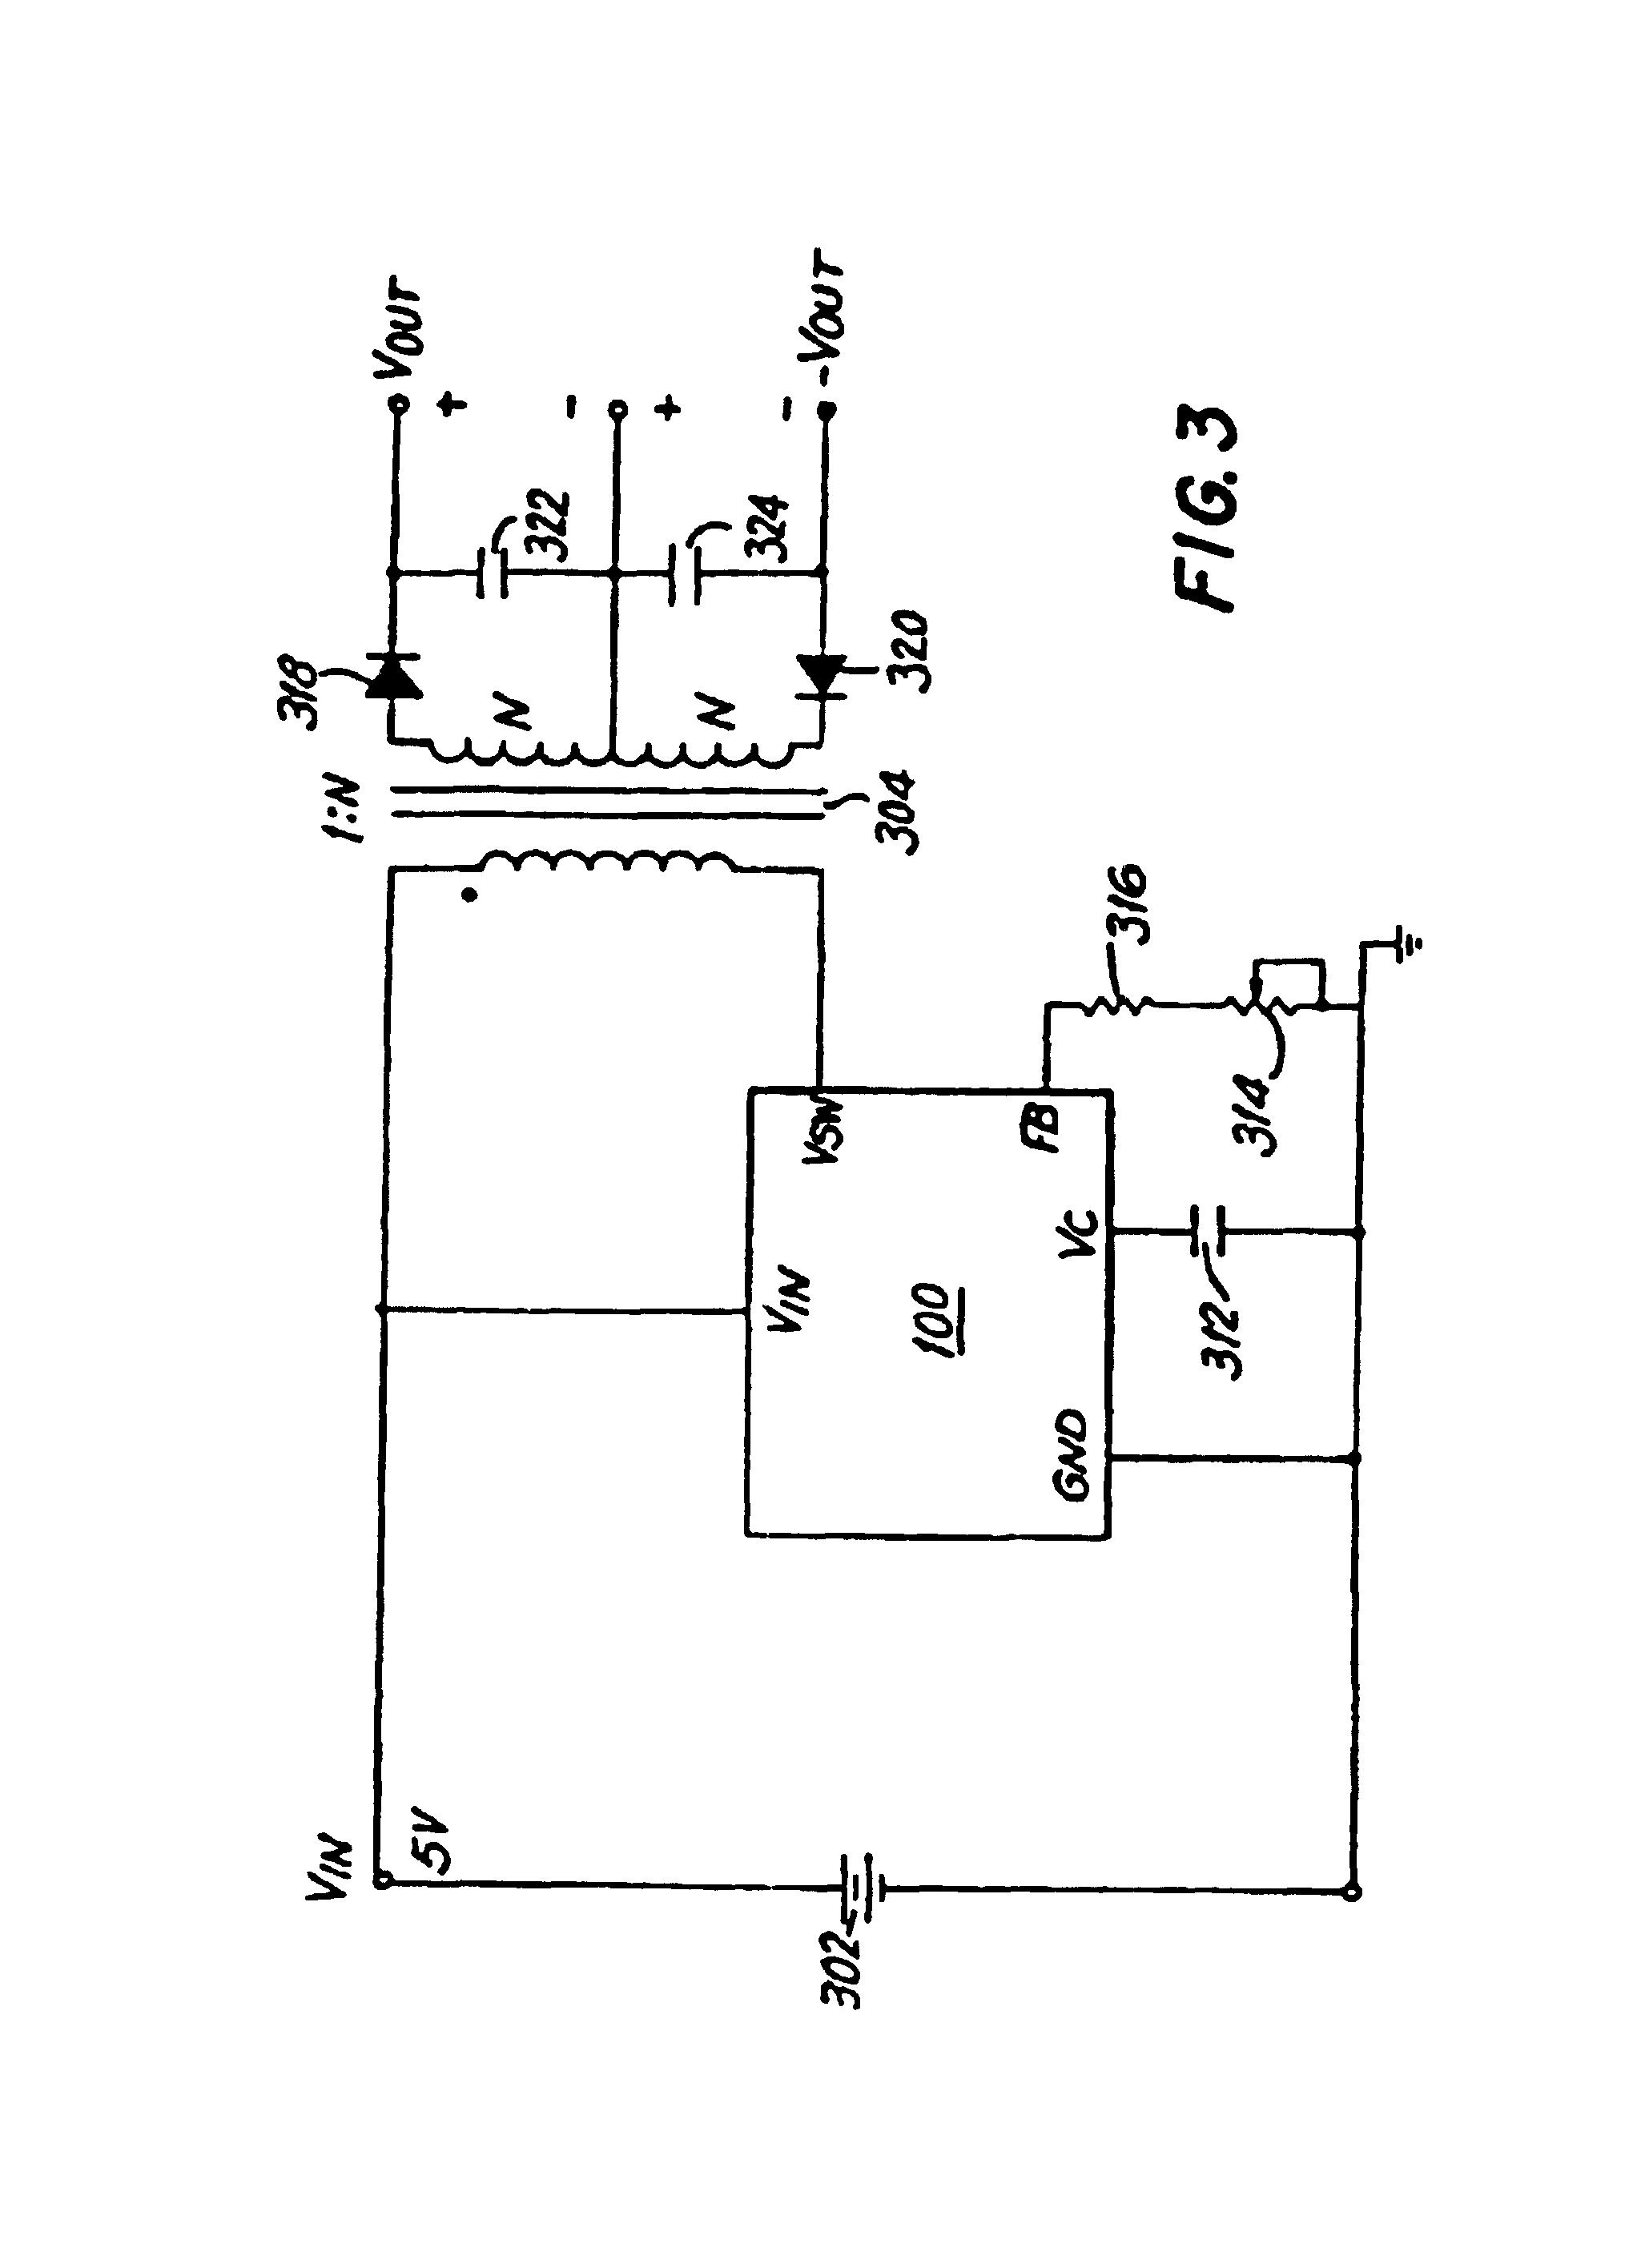 Patent Usre